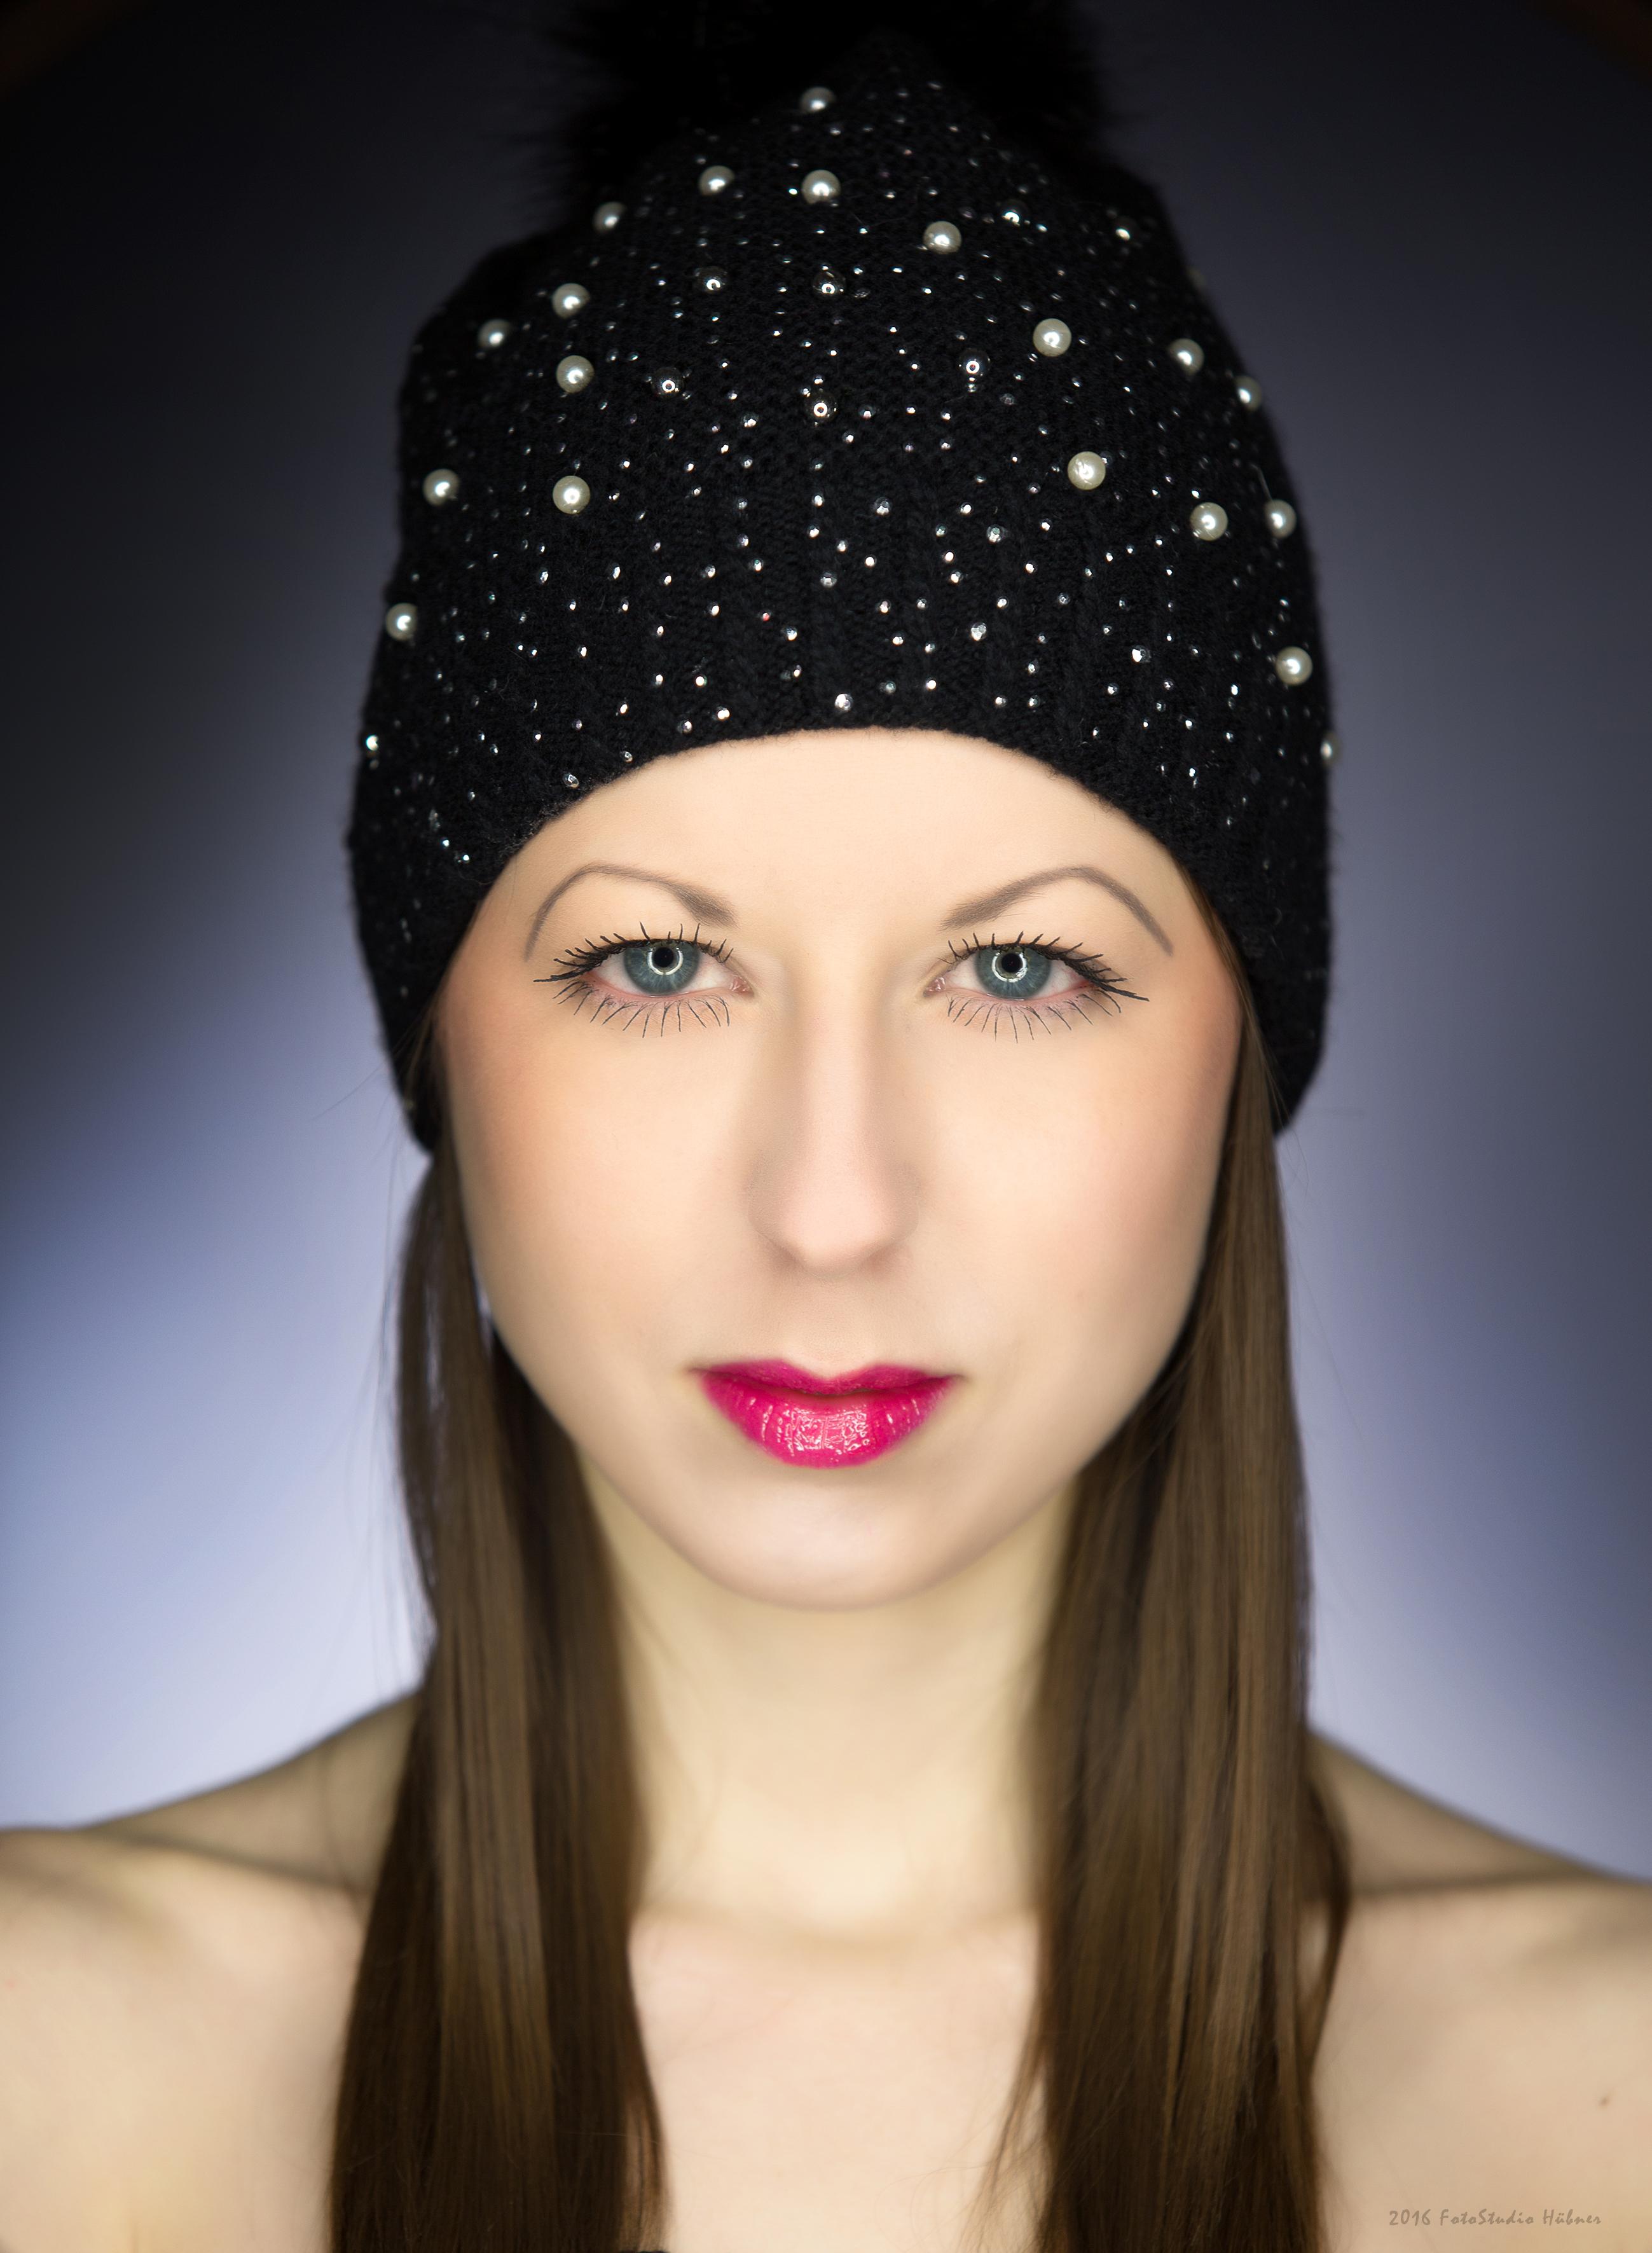 Frauen FotoShooting Astrid M.Hübner